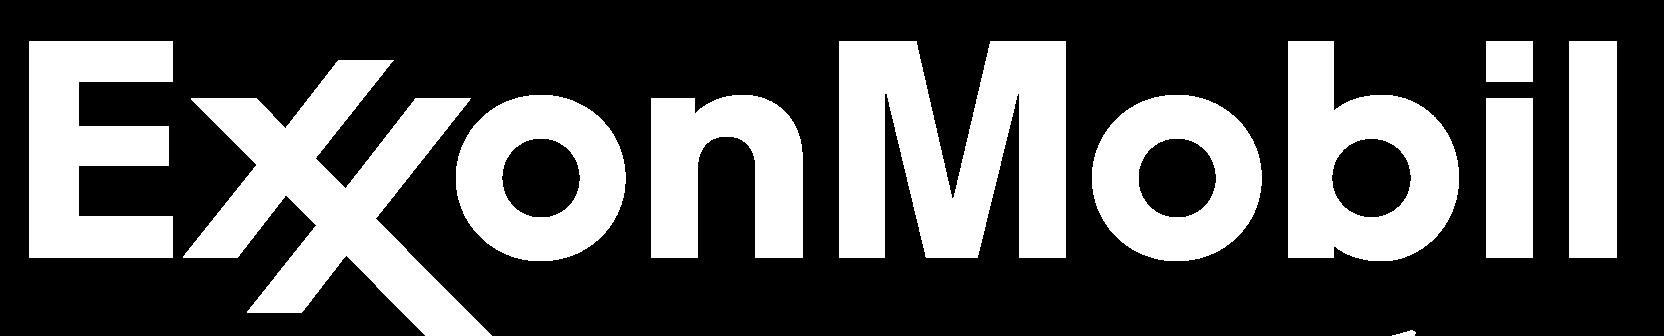 exxonmobil-development-1-logo-black-and-white.png